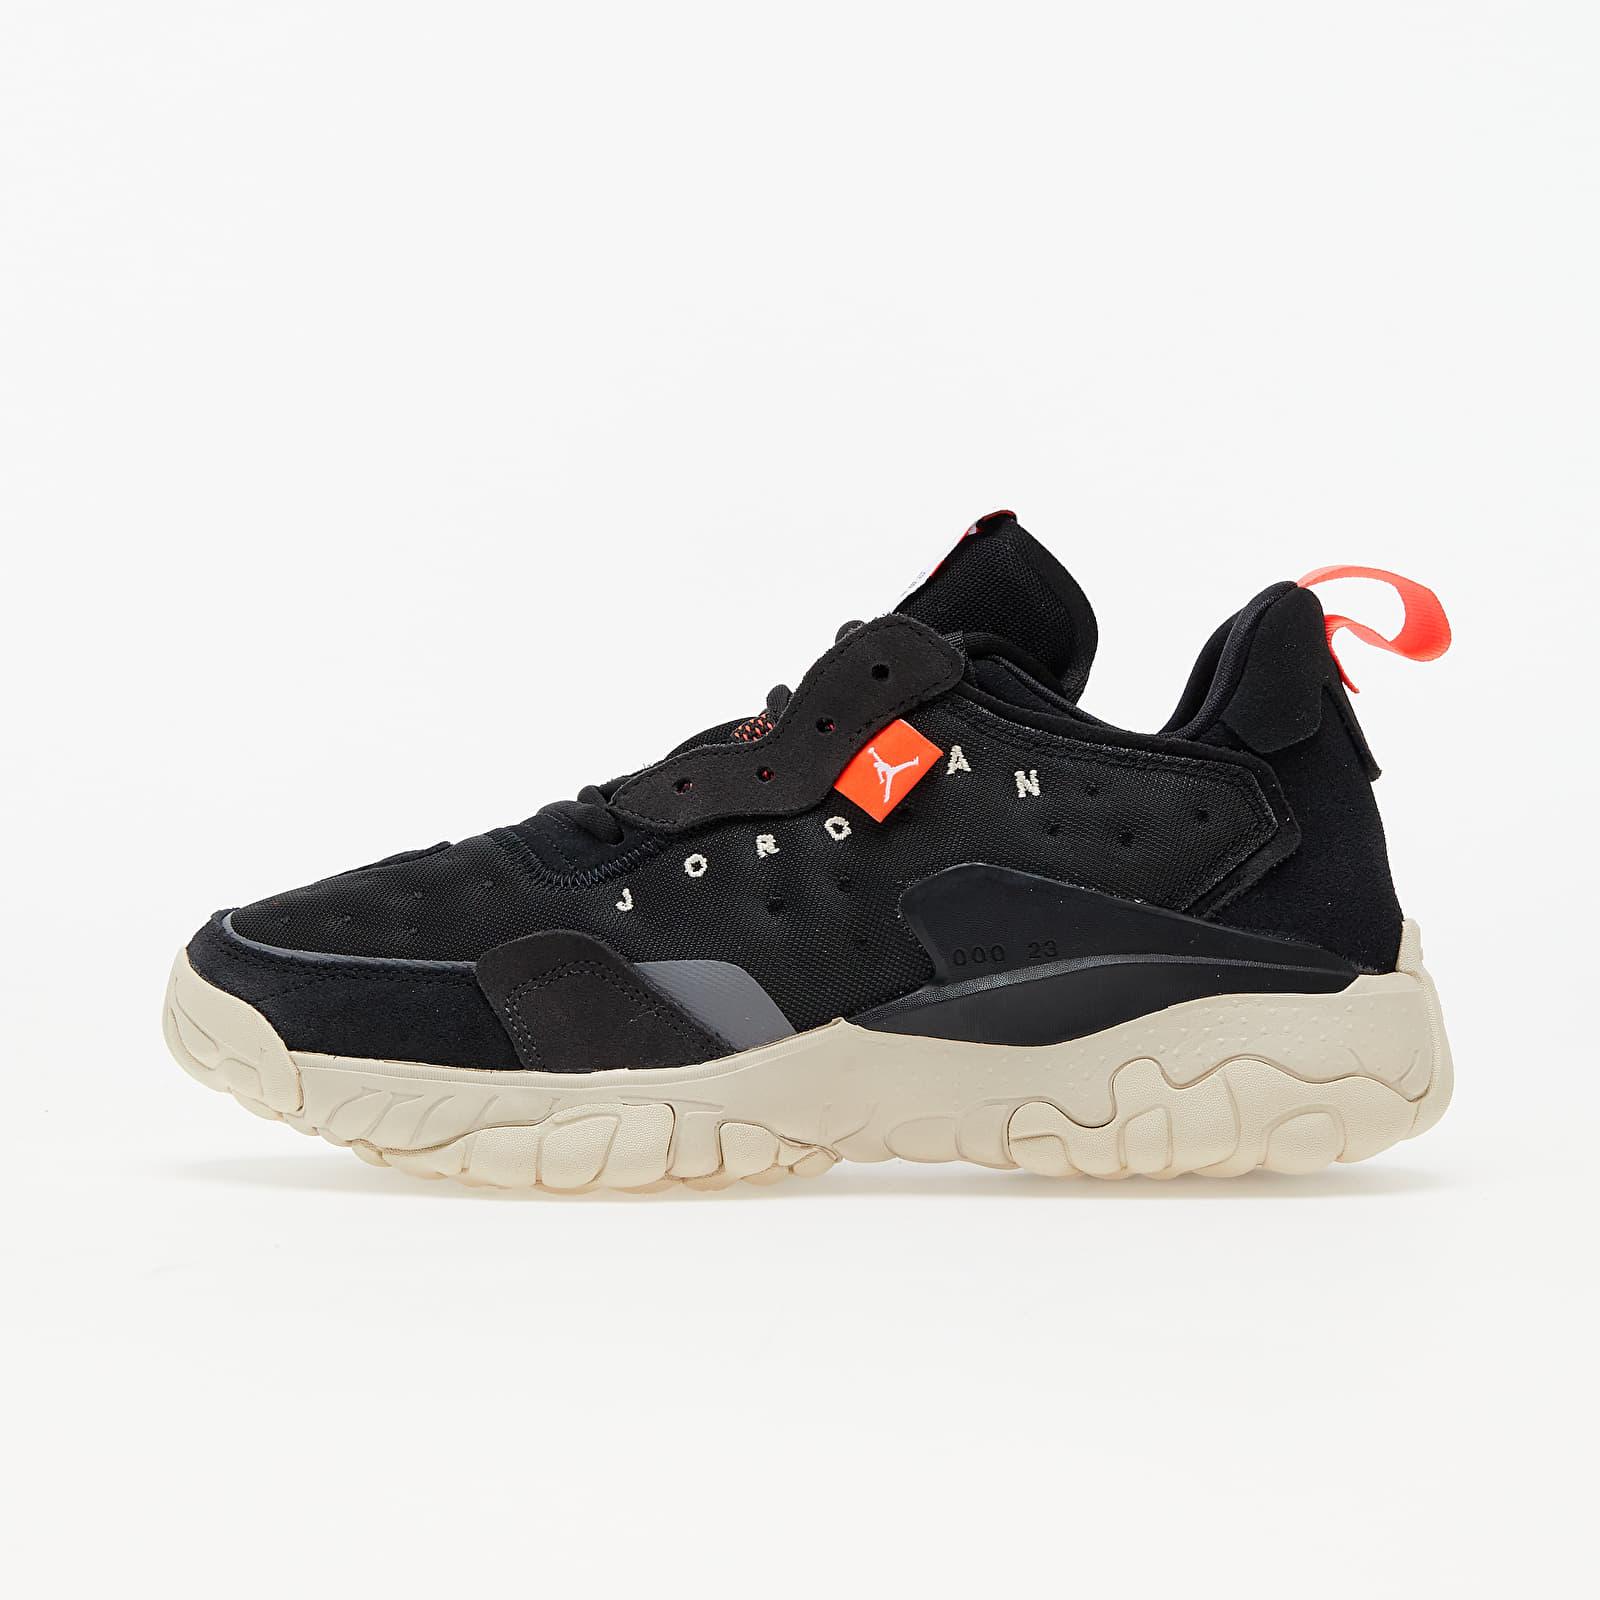 Jordan W Delta 2 Black/ Infrared 23-Off Noir-Oatmeal EUR 41